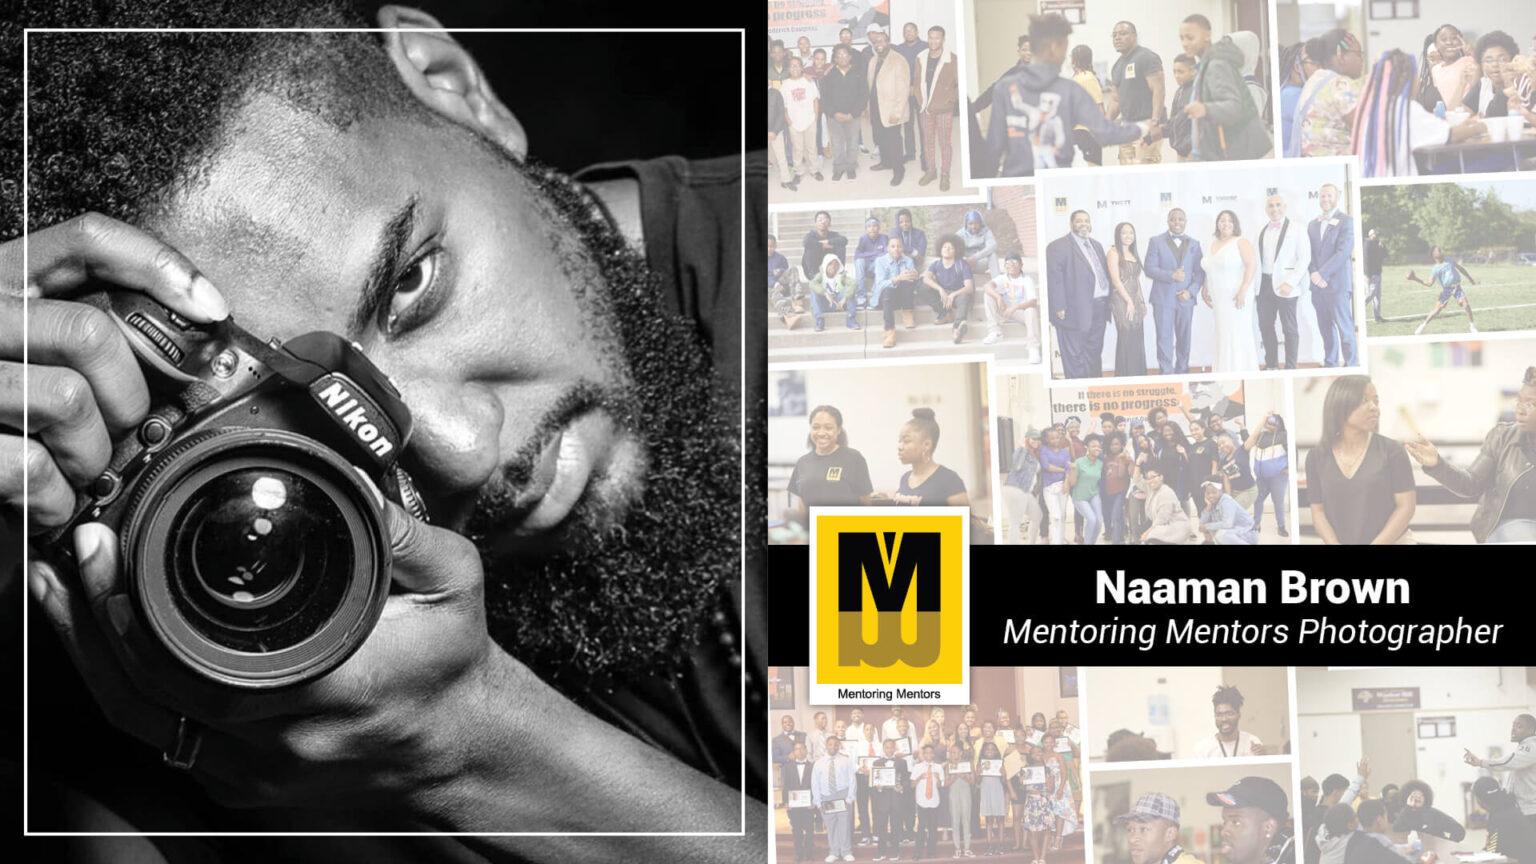 Mentoring Mentors Photographer